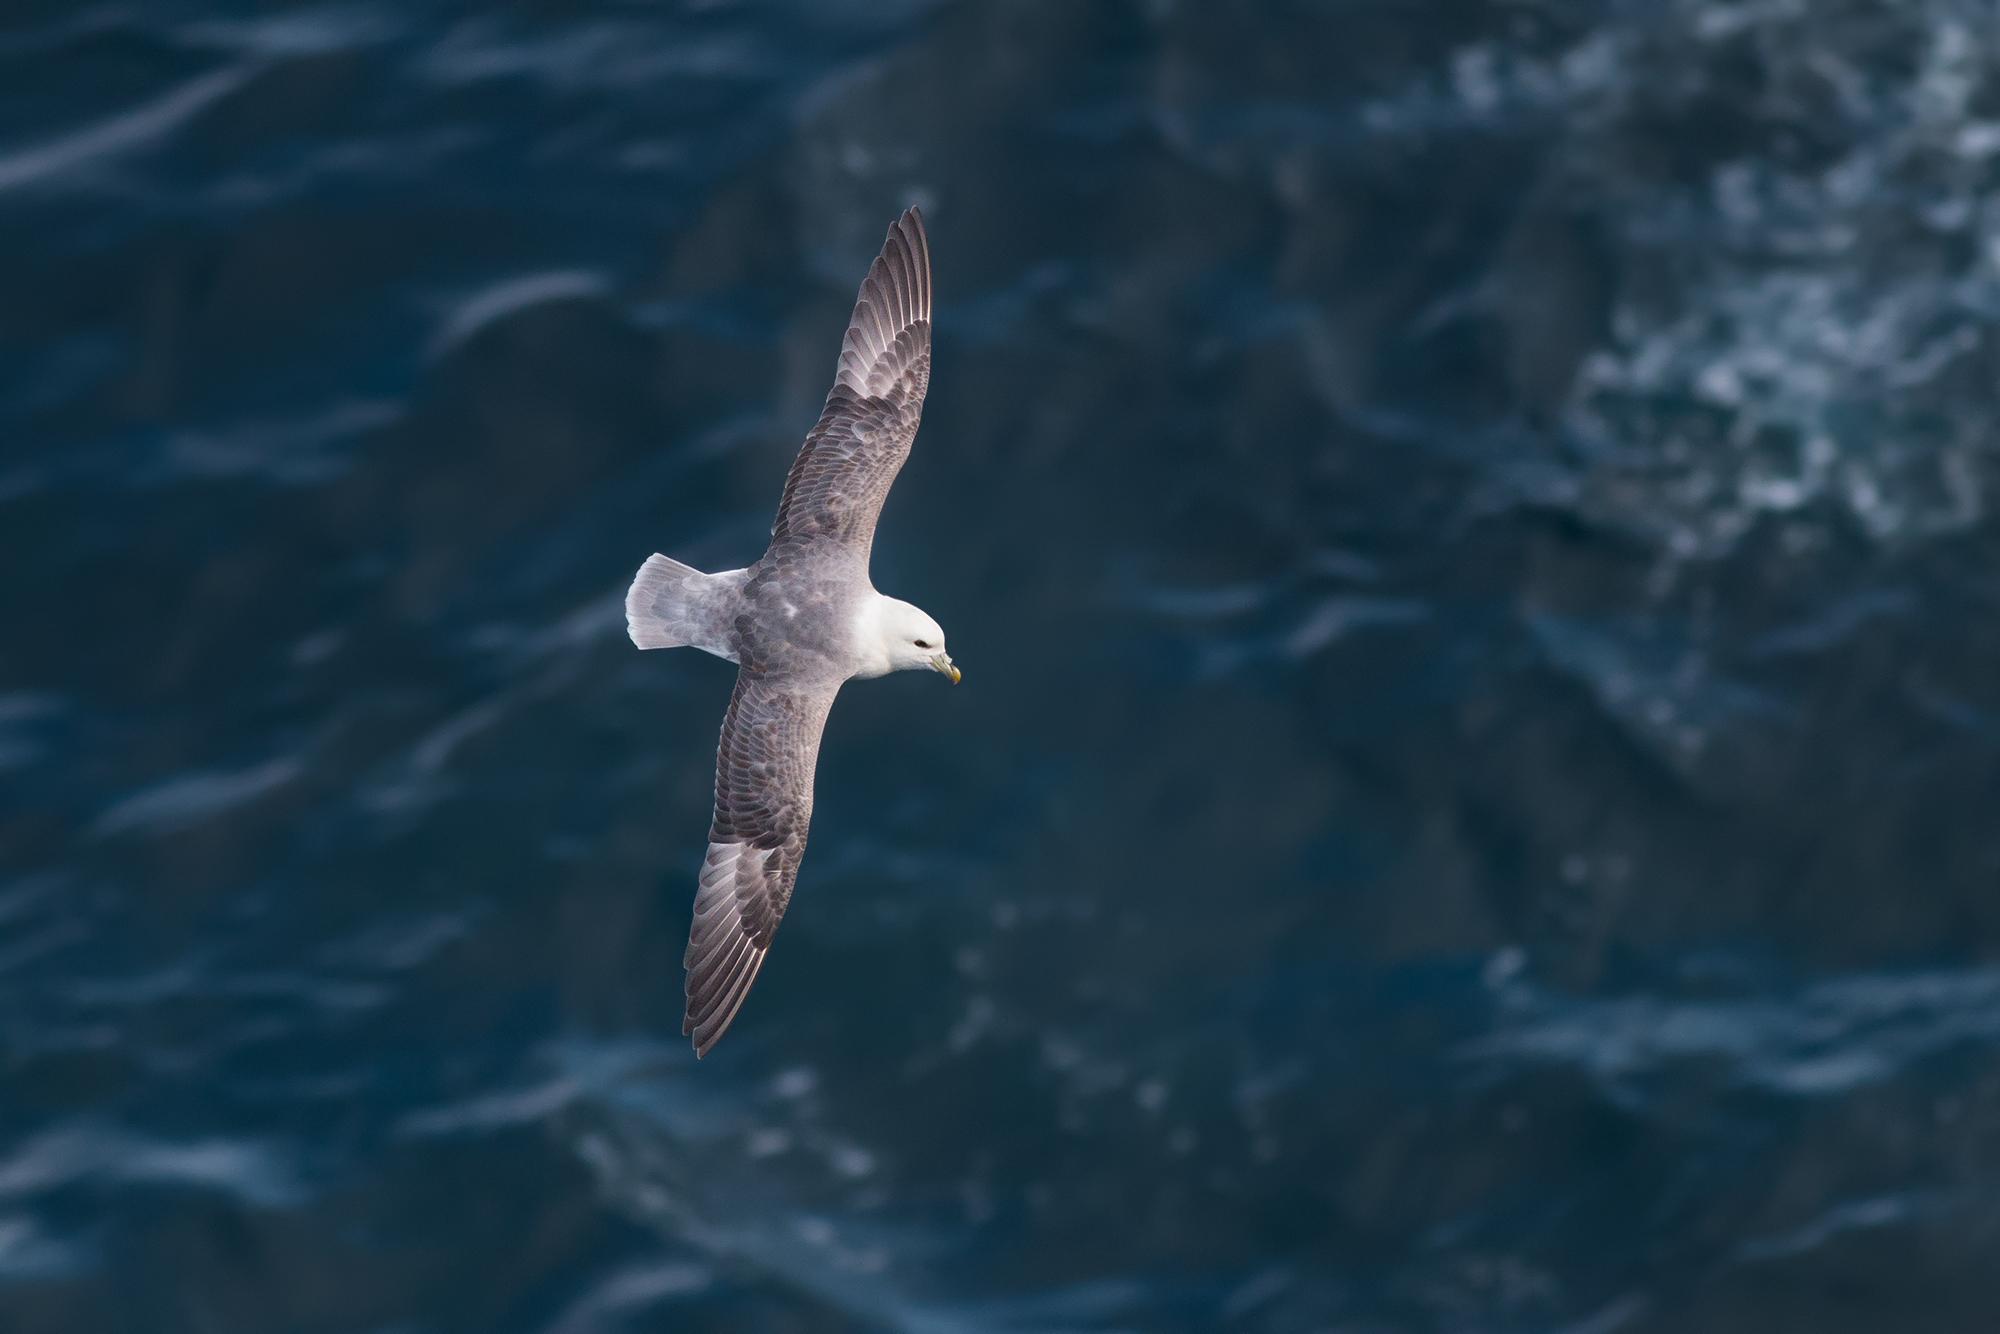 Stormfågel-JPEG_web 9.jpg